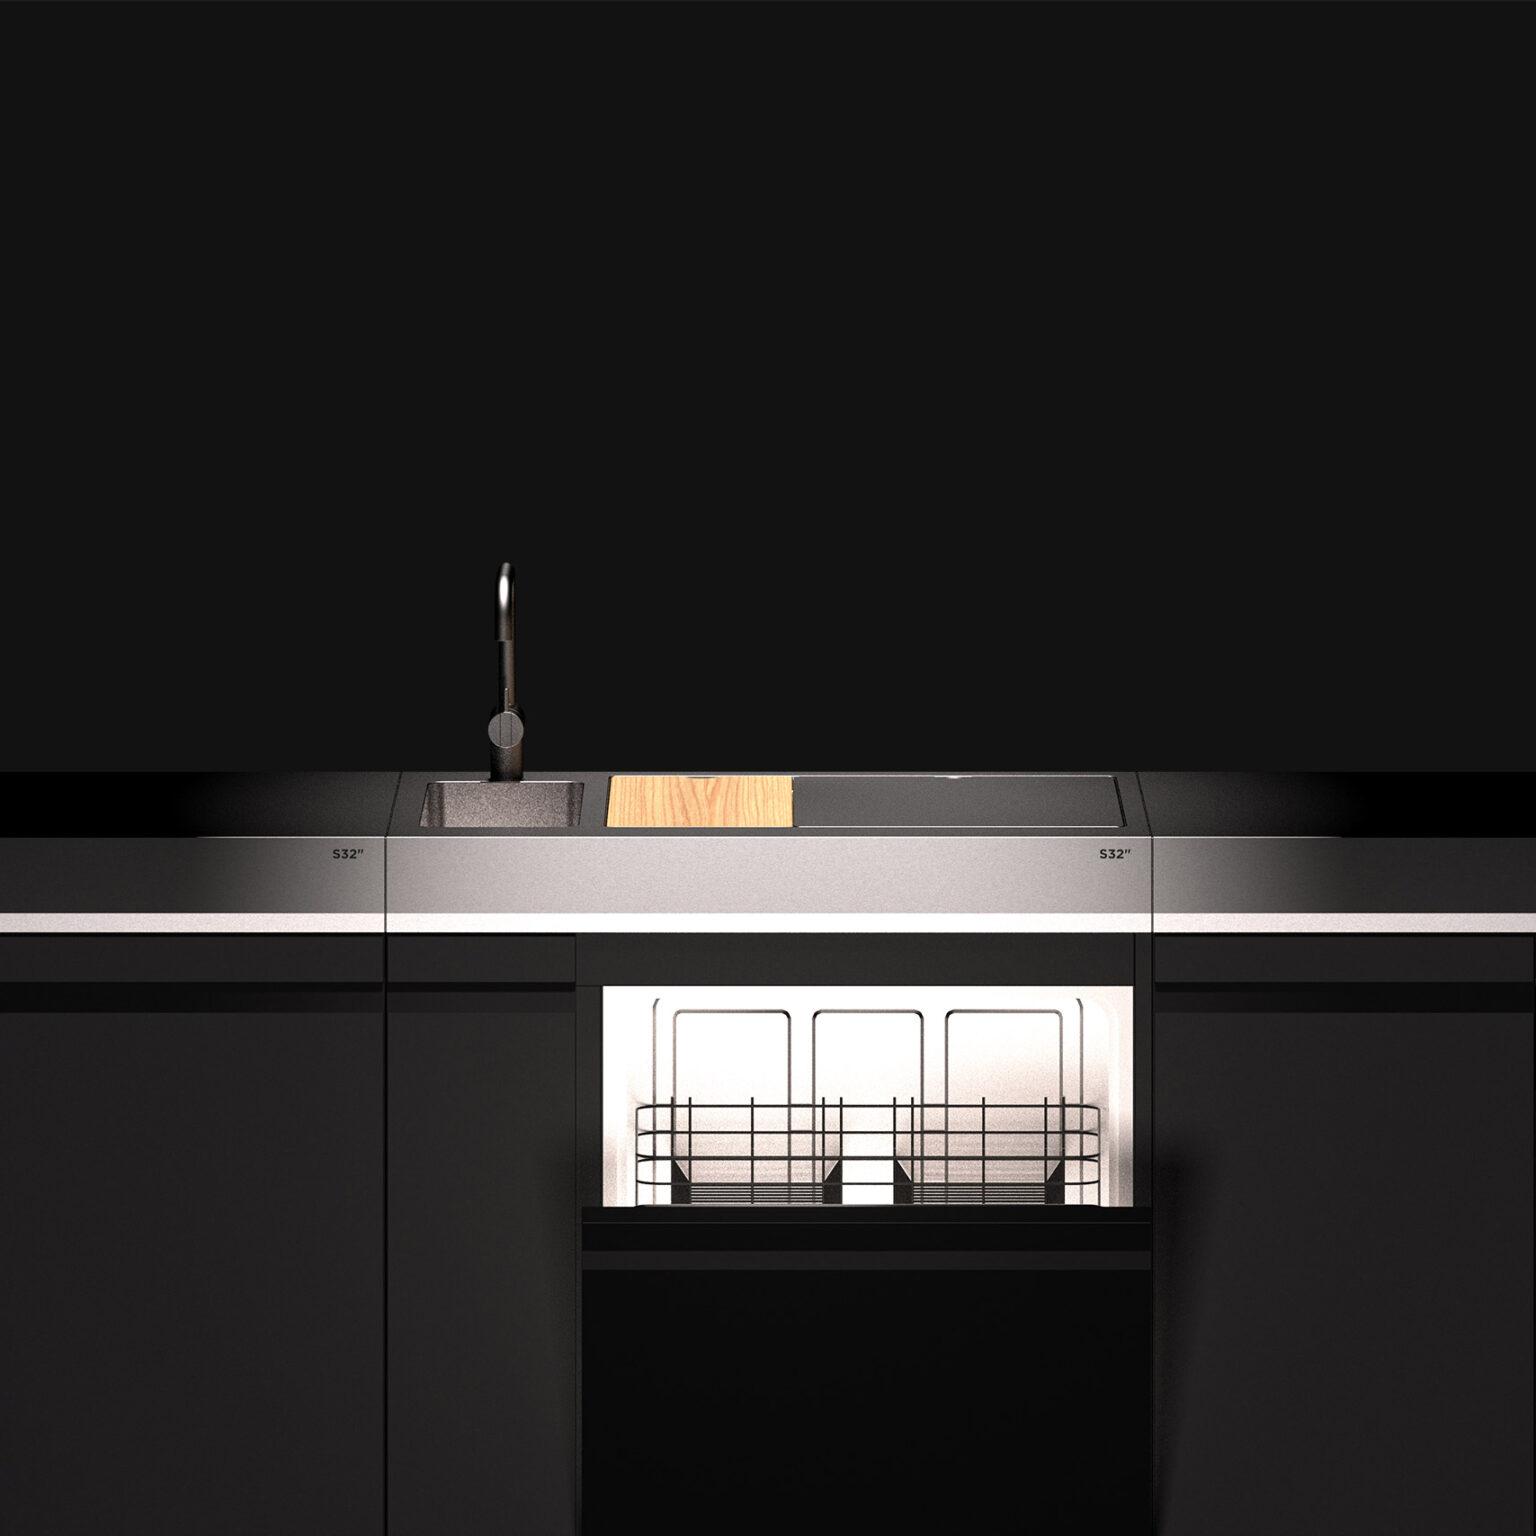 S32_dishwasher-m